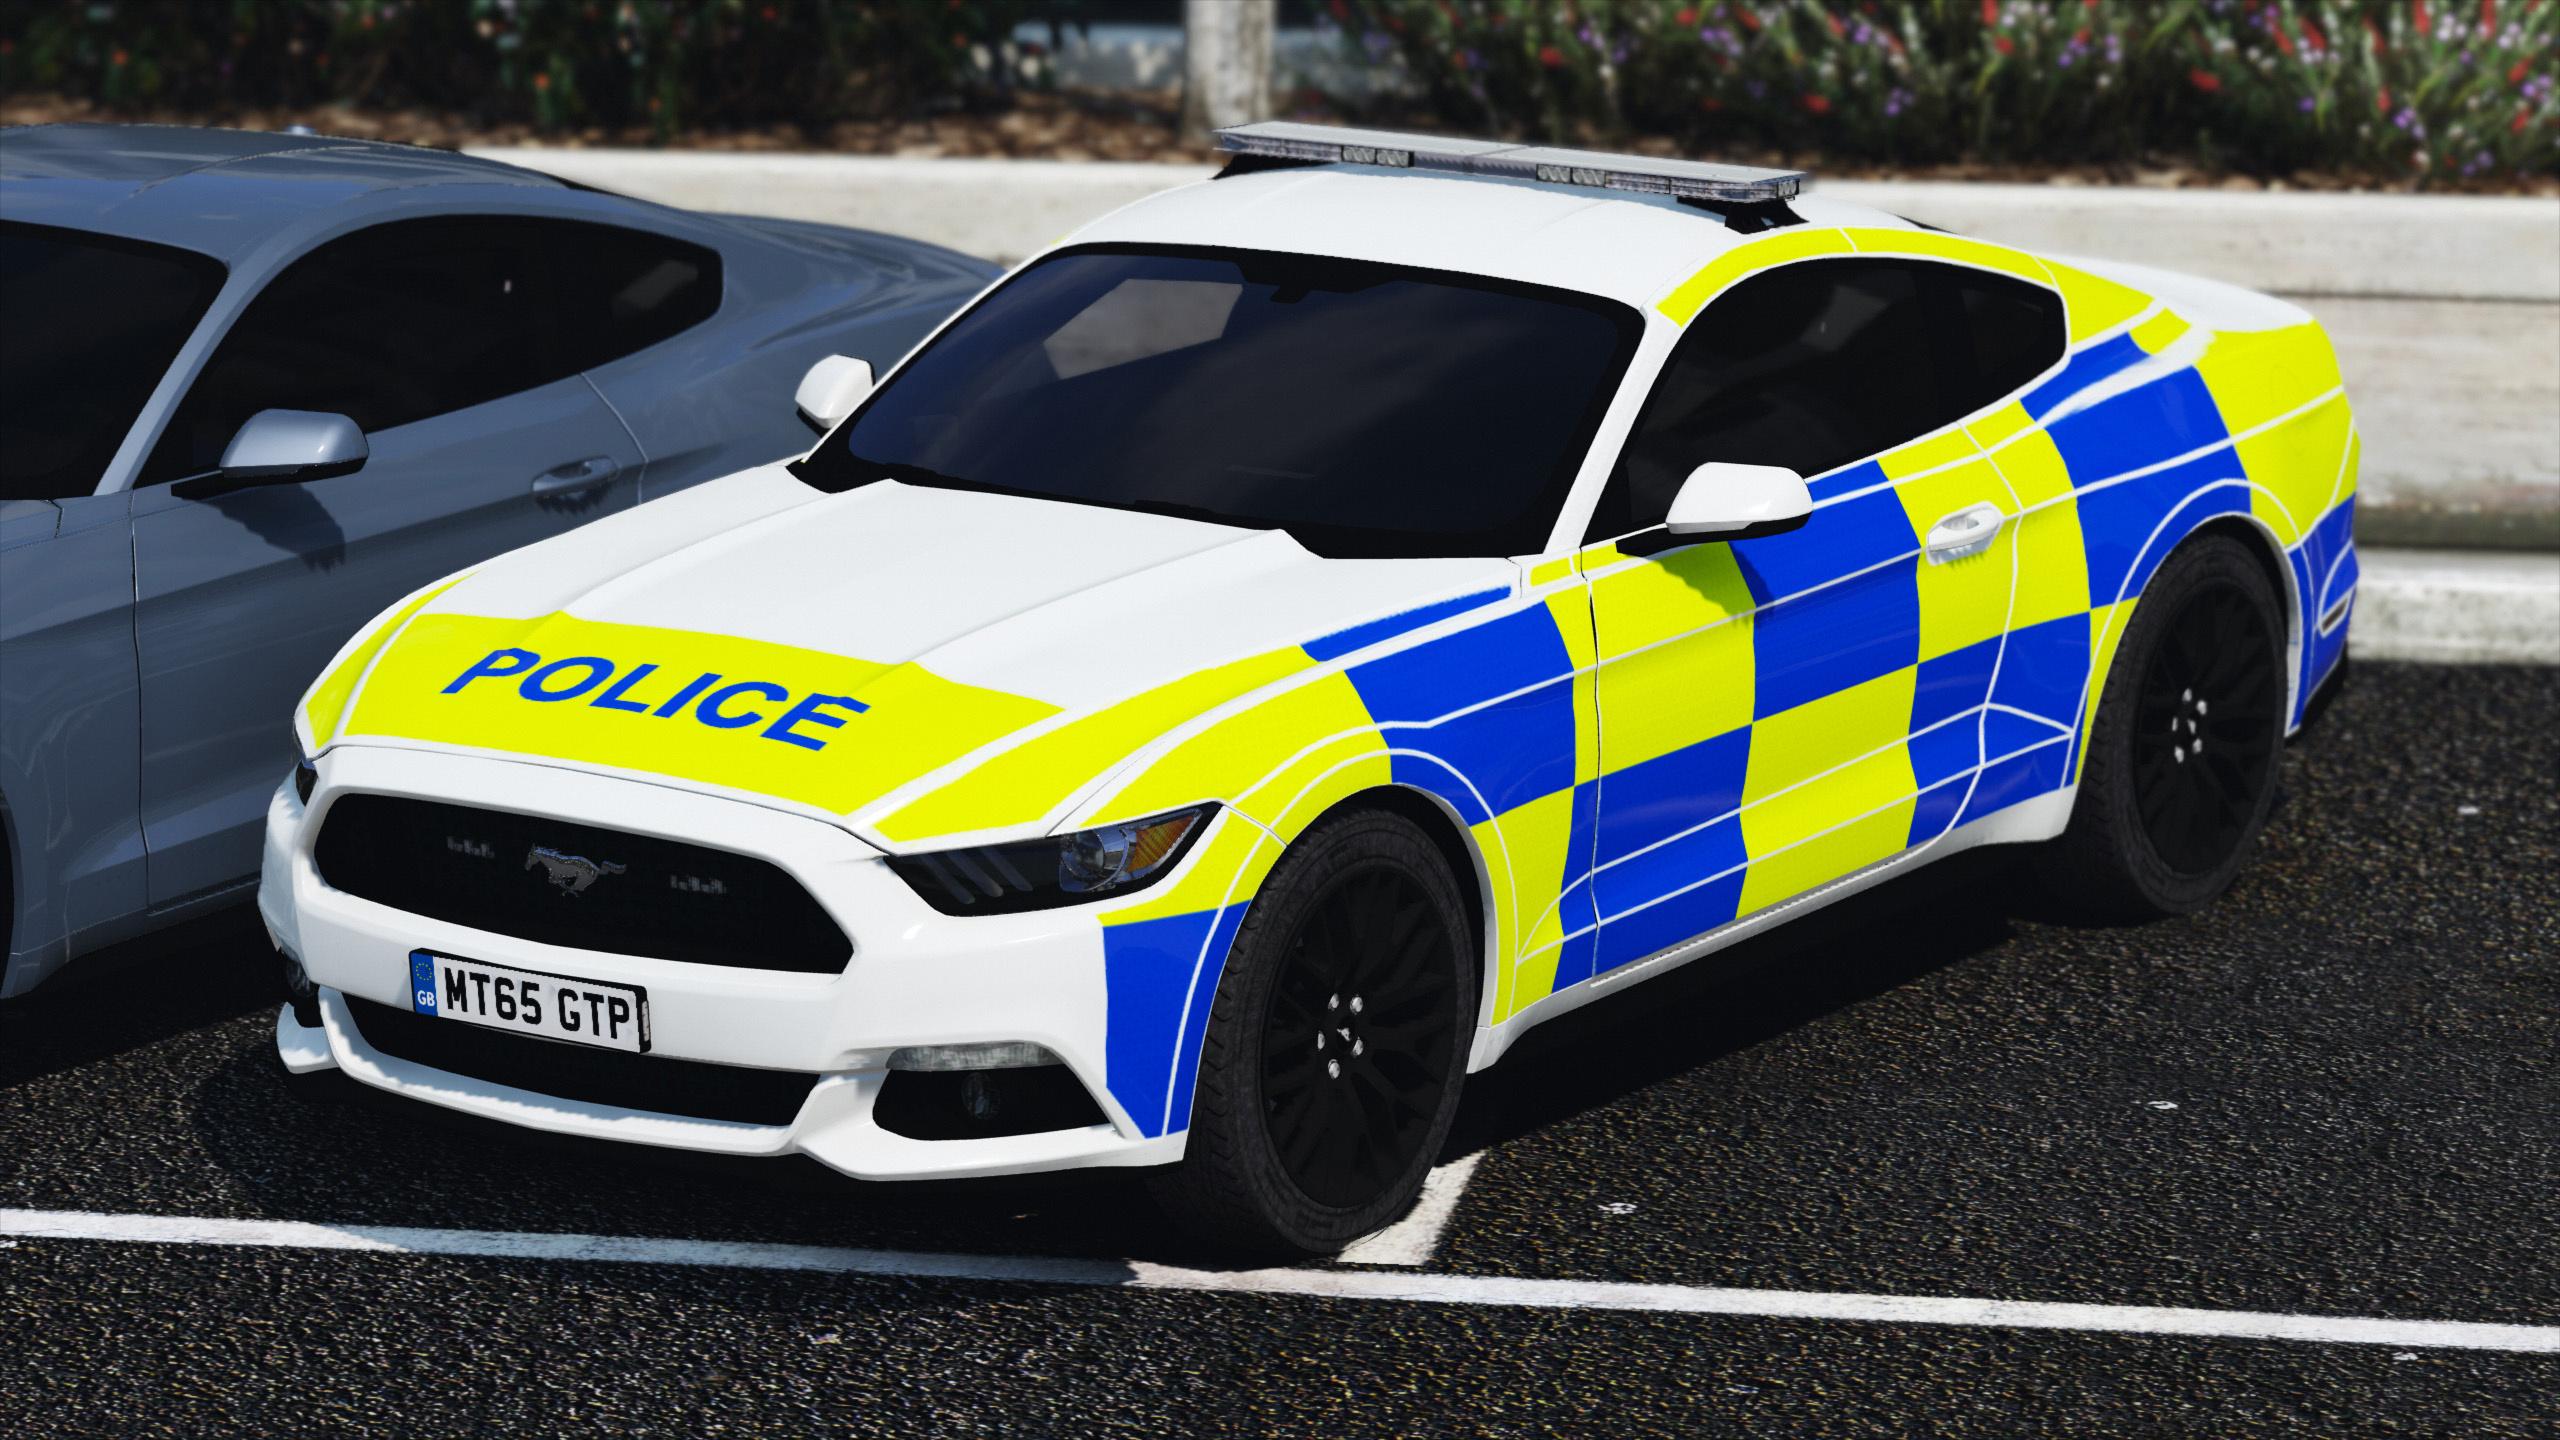 2015 police ford mustang showcar pack gta5. Black Bedroom Furniture Sets. Home Design Ideas